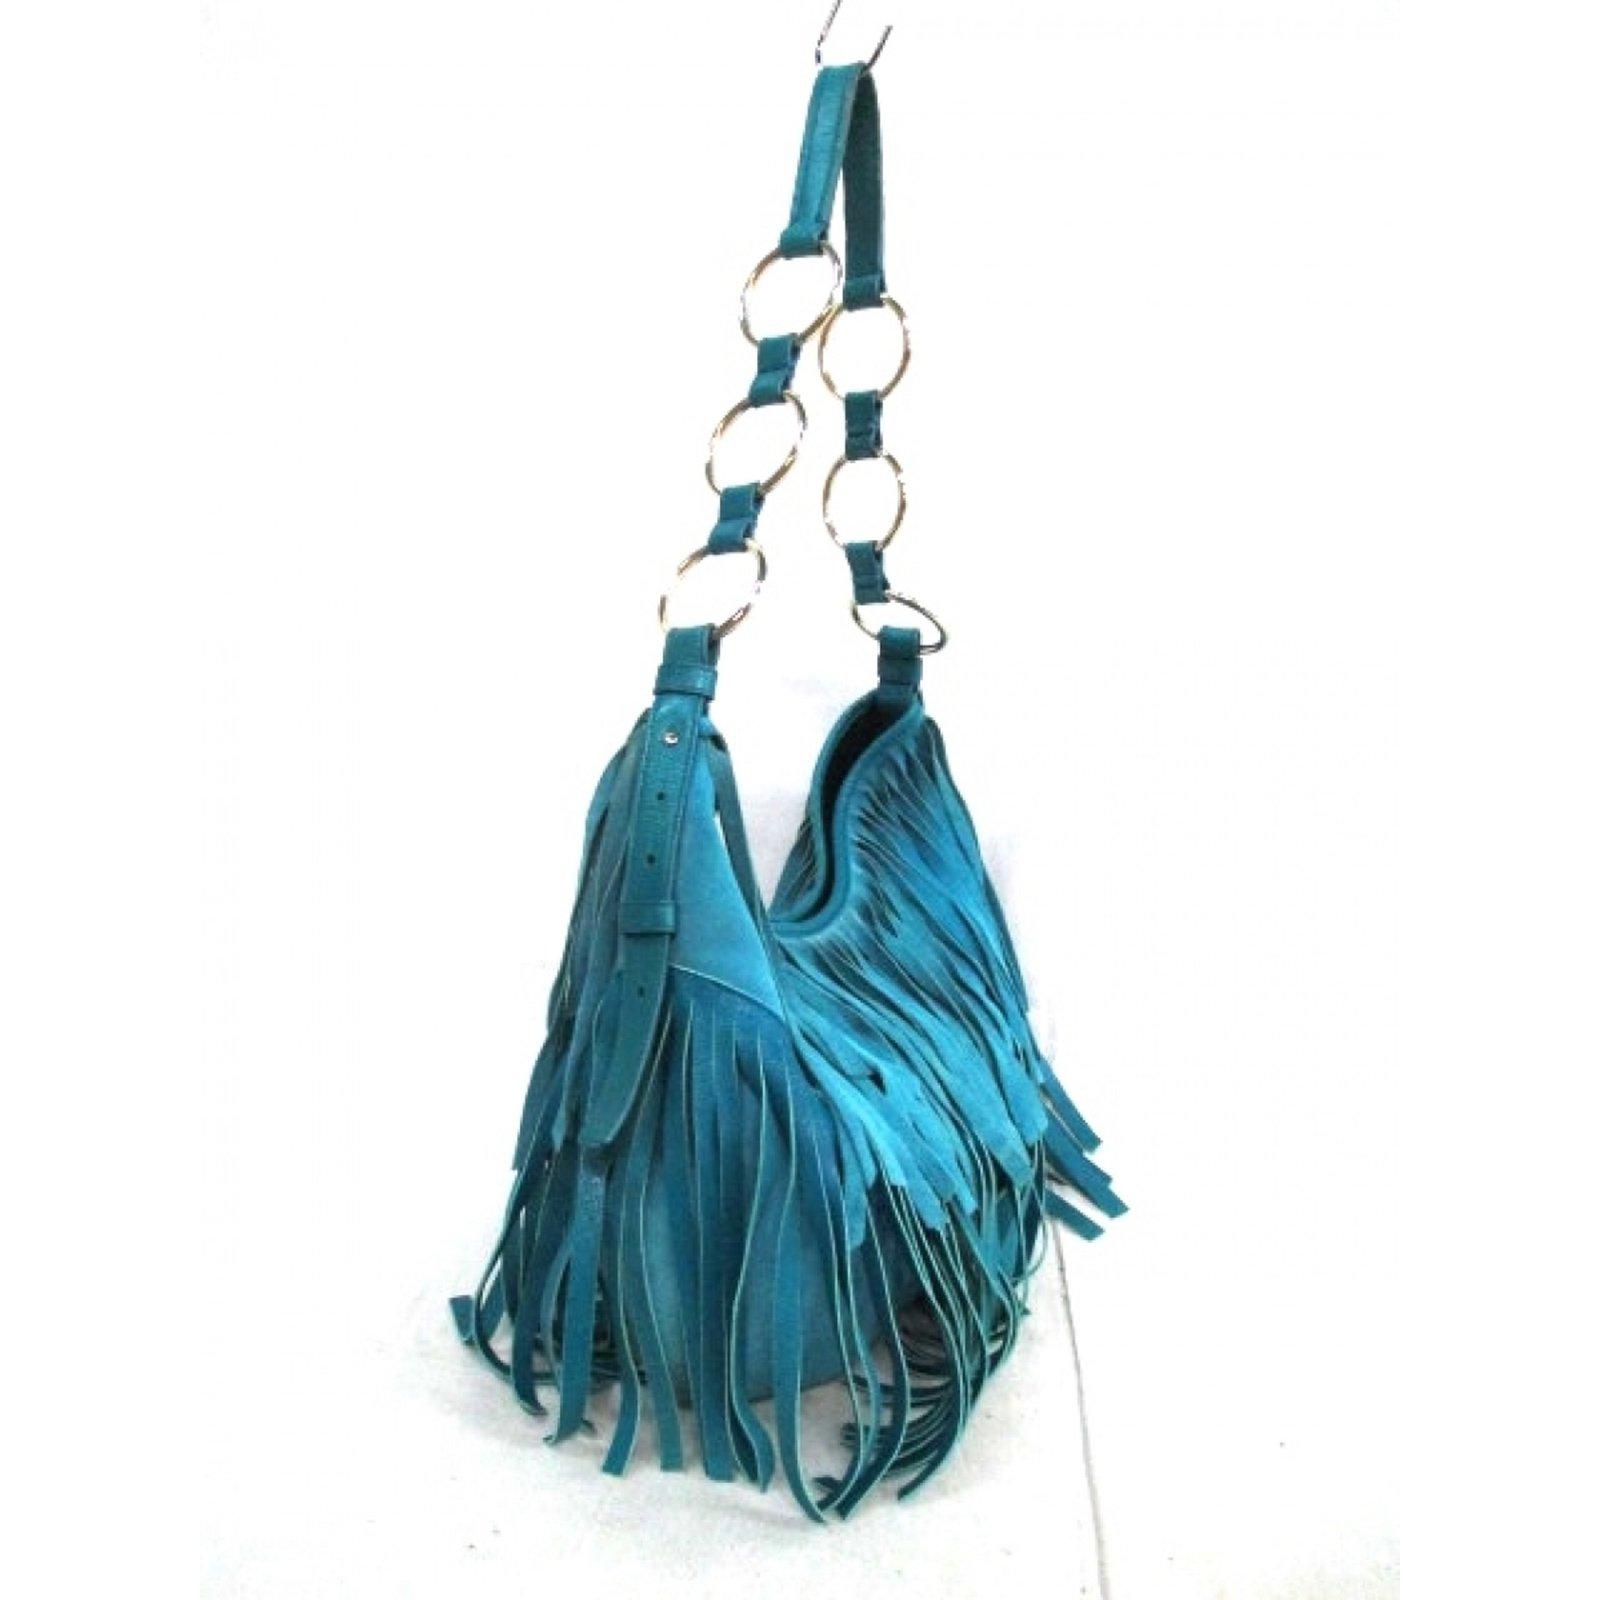 5e52abbf47 Yves Saint Laurent YSL La Boheme Bag Handbags Suede,Leather Blue ref.34904  - Joli Closet